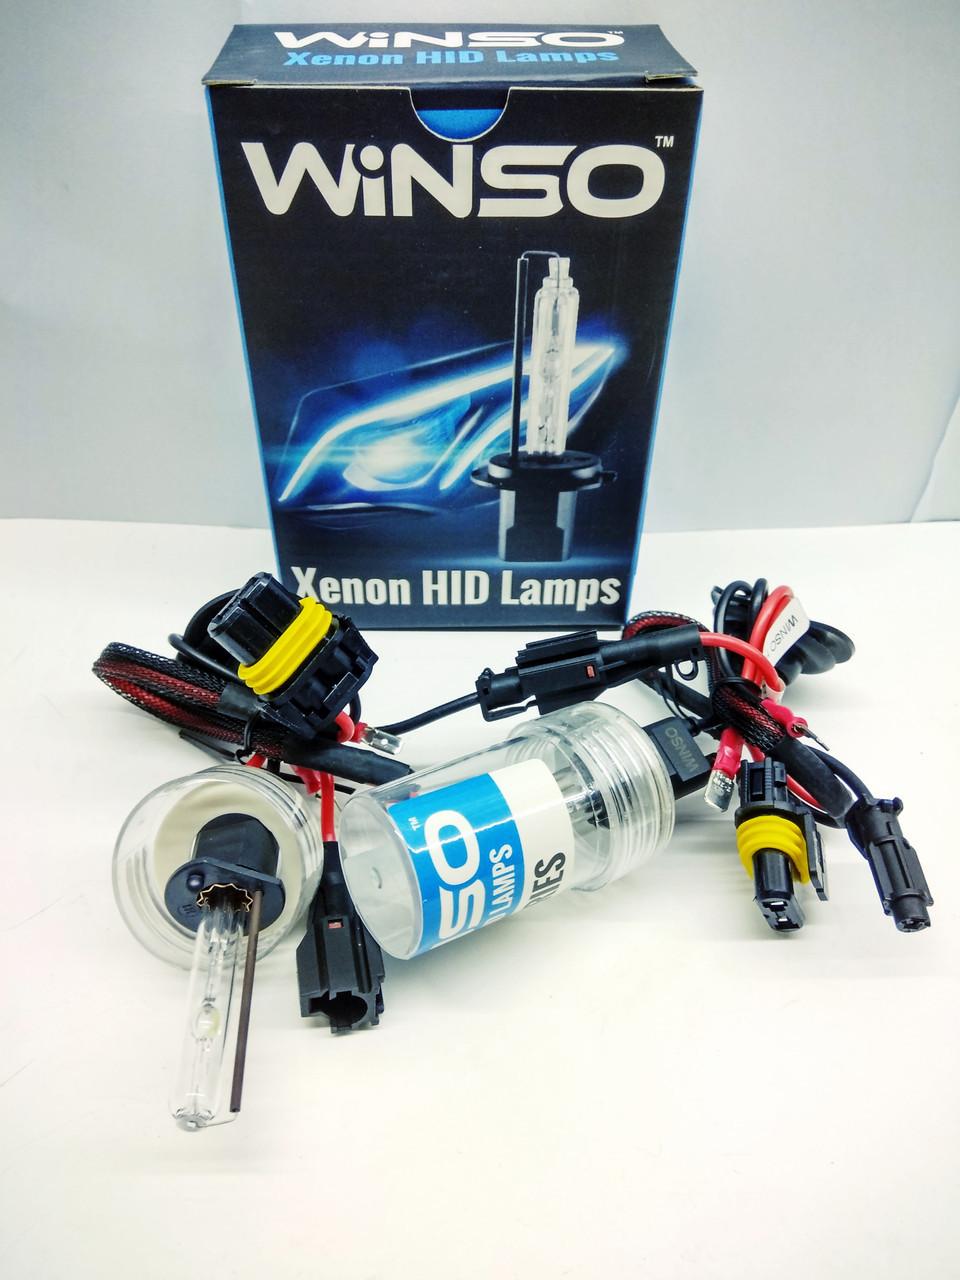 Лампа ксеноновая Winso H1, 6000K, 85V, 35W, P14.5s KET, 2 шт.